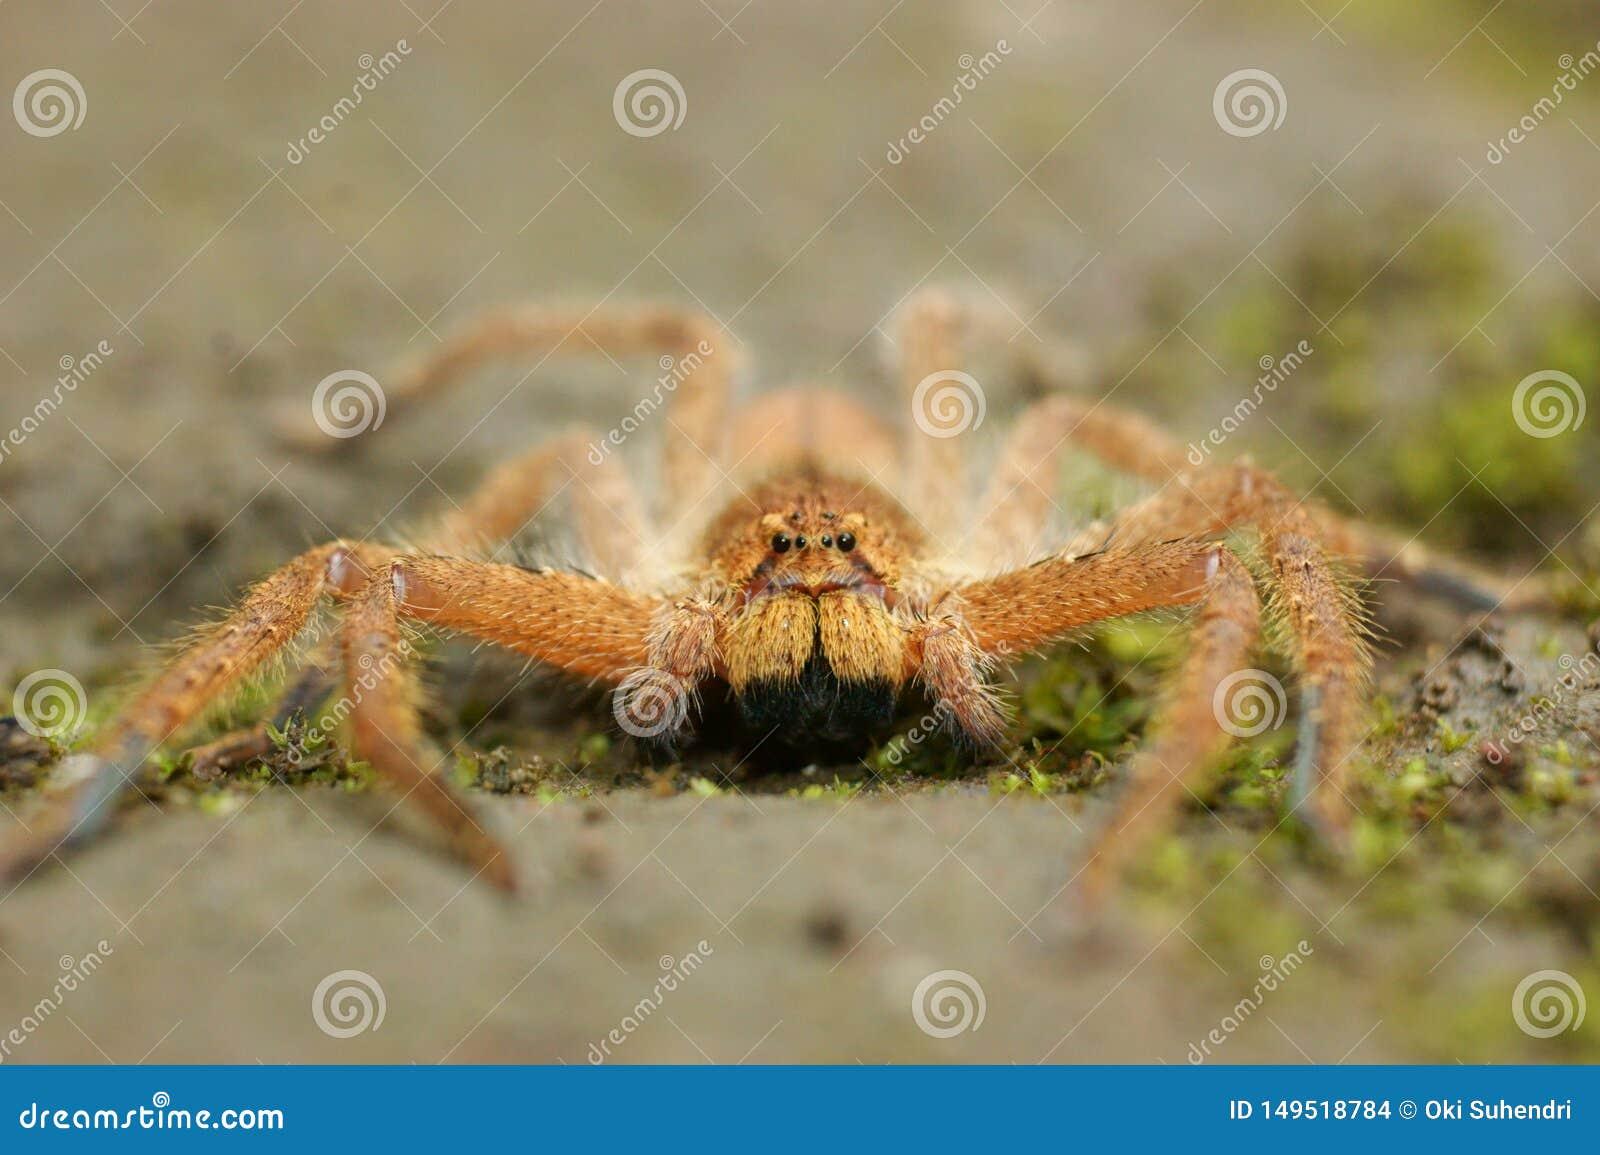 As aranhas na ?rea da floresta, Bandung, Indon?sia